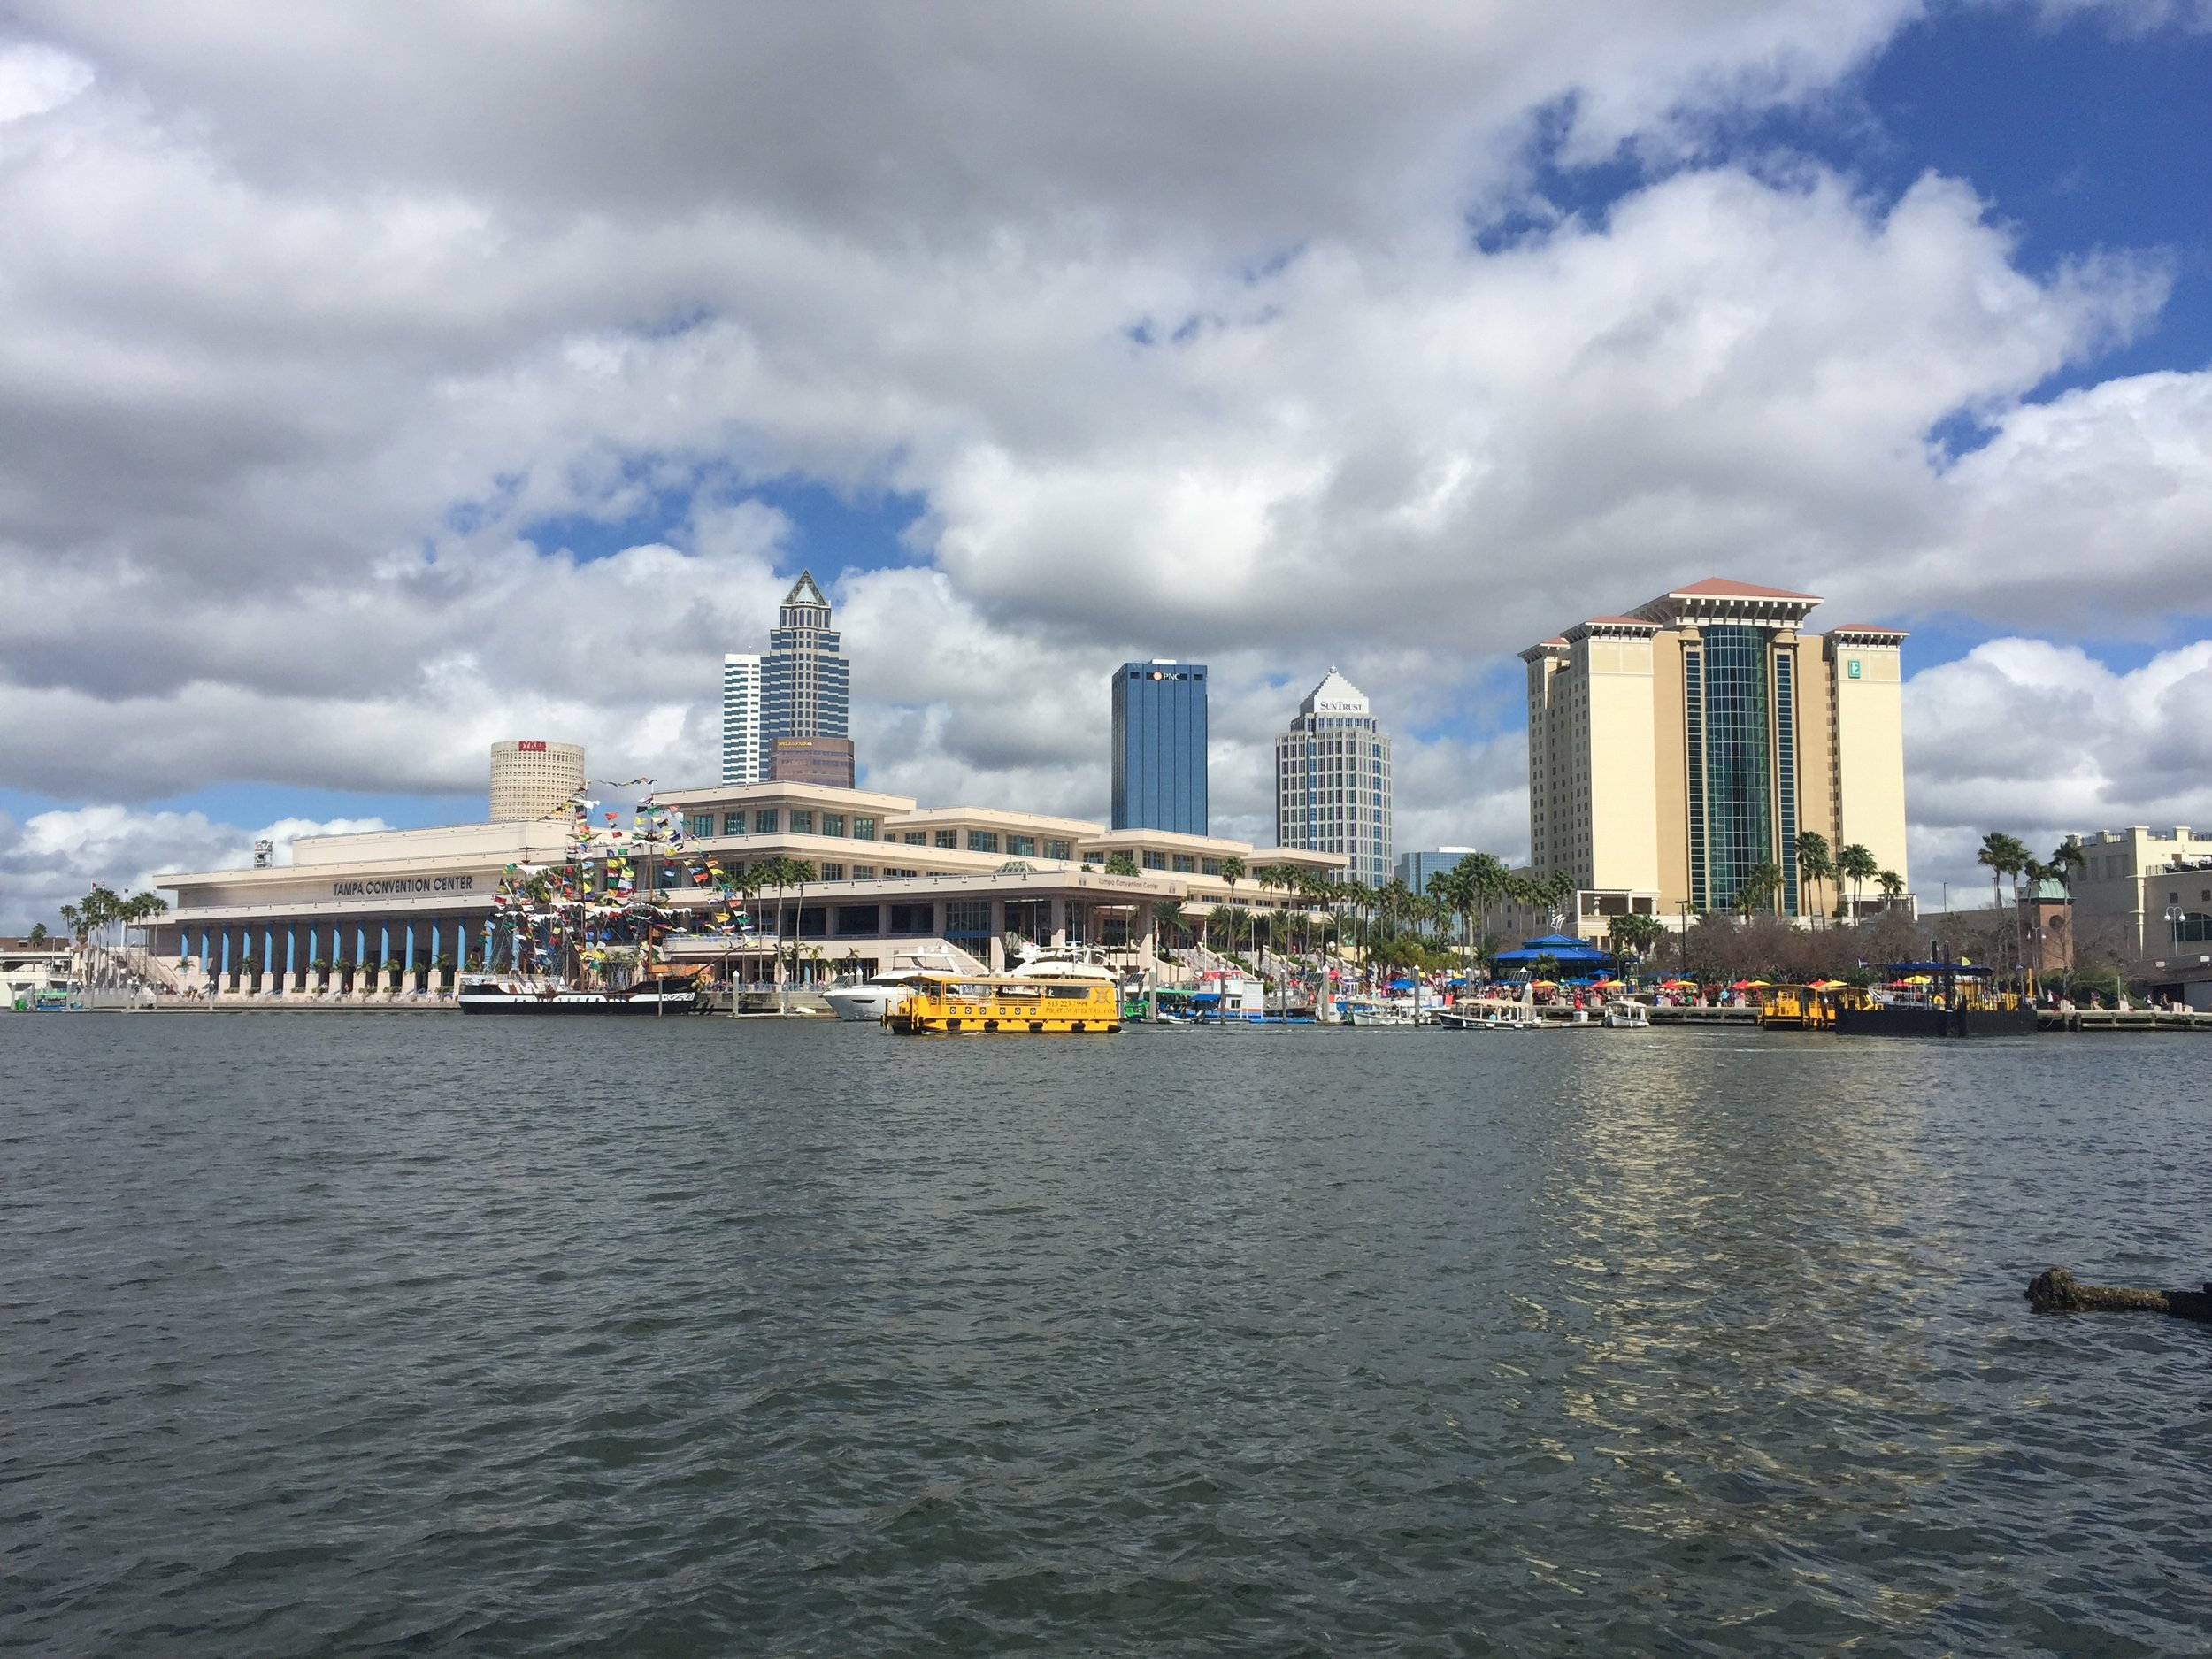 Exploring downtown Tampa!